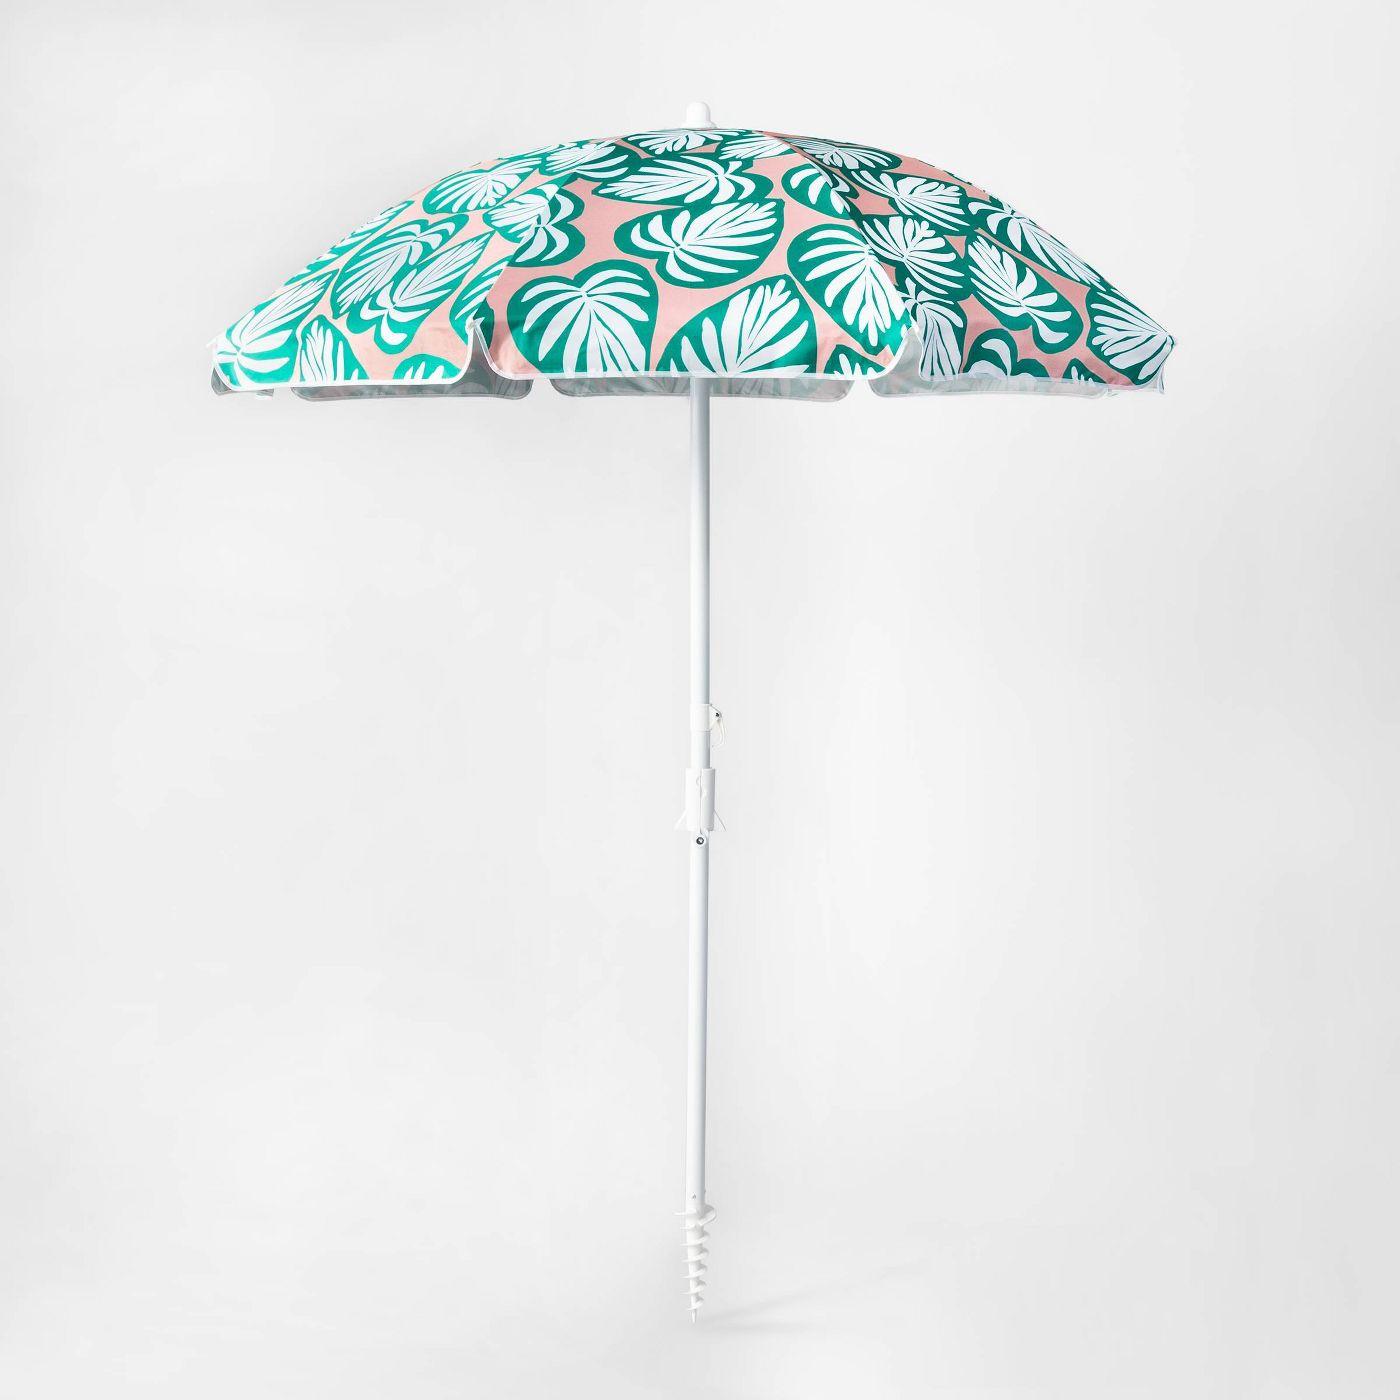 6' Palm Print Beach Umbrella Green/Pink - Sun Squad™ - image 1 of 5